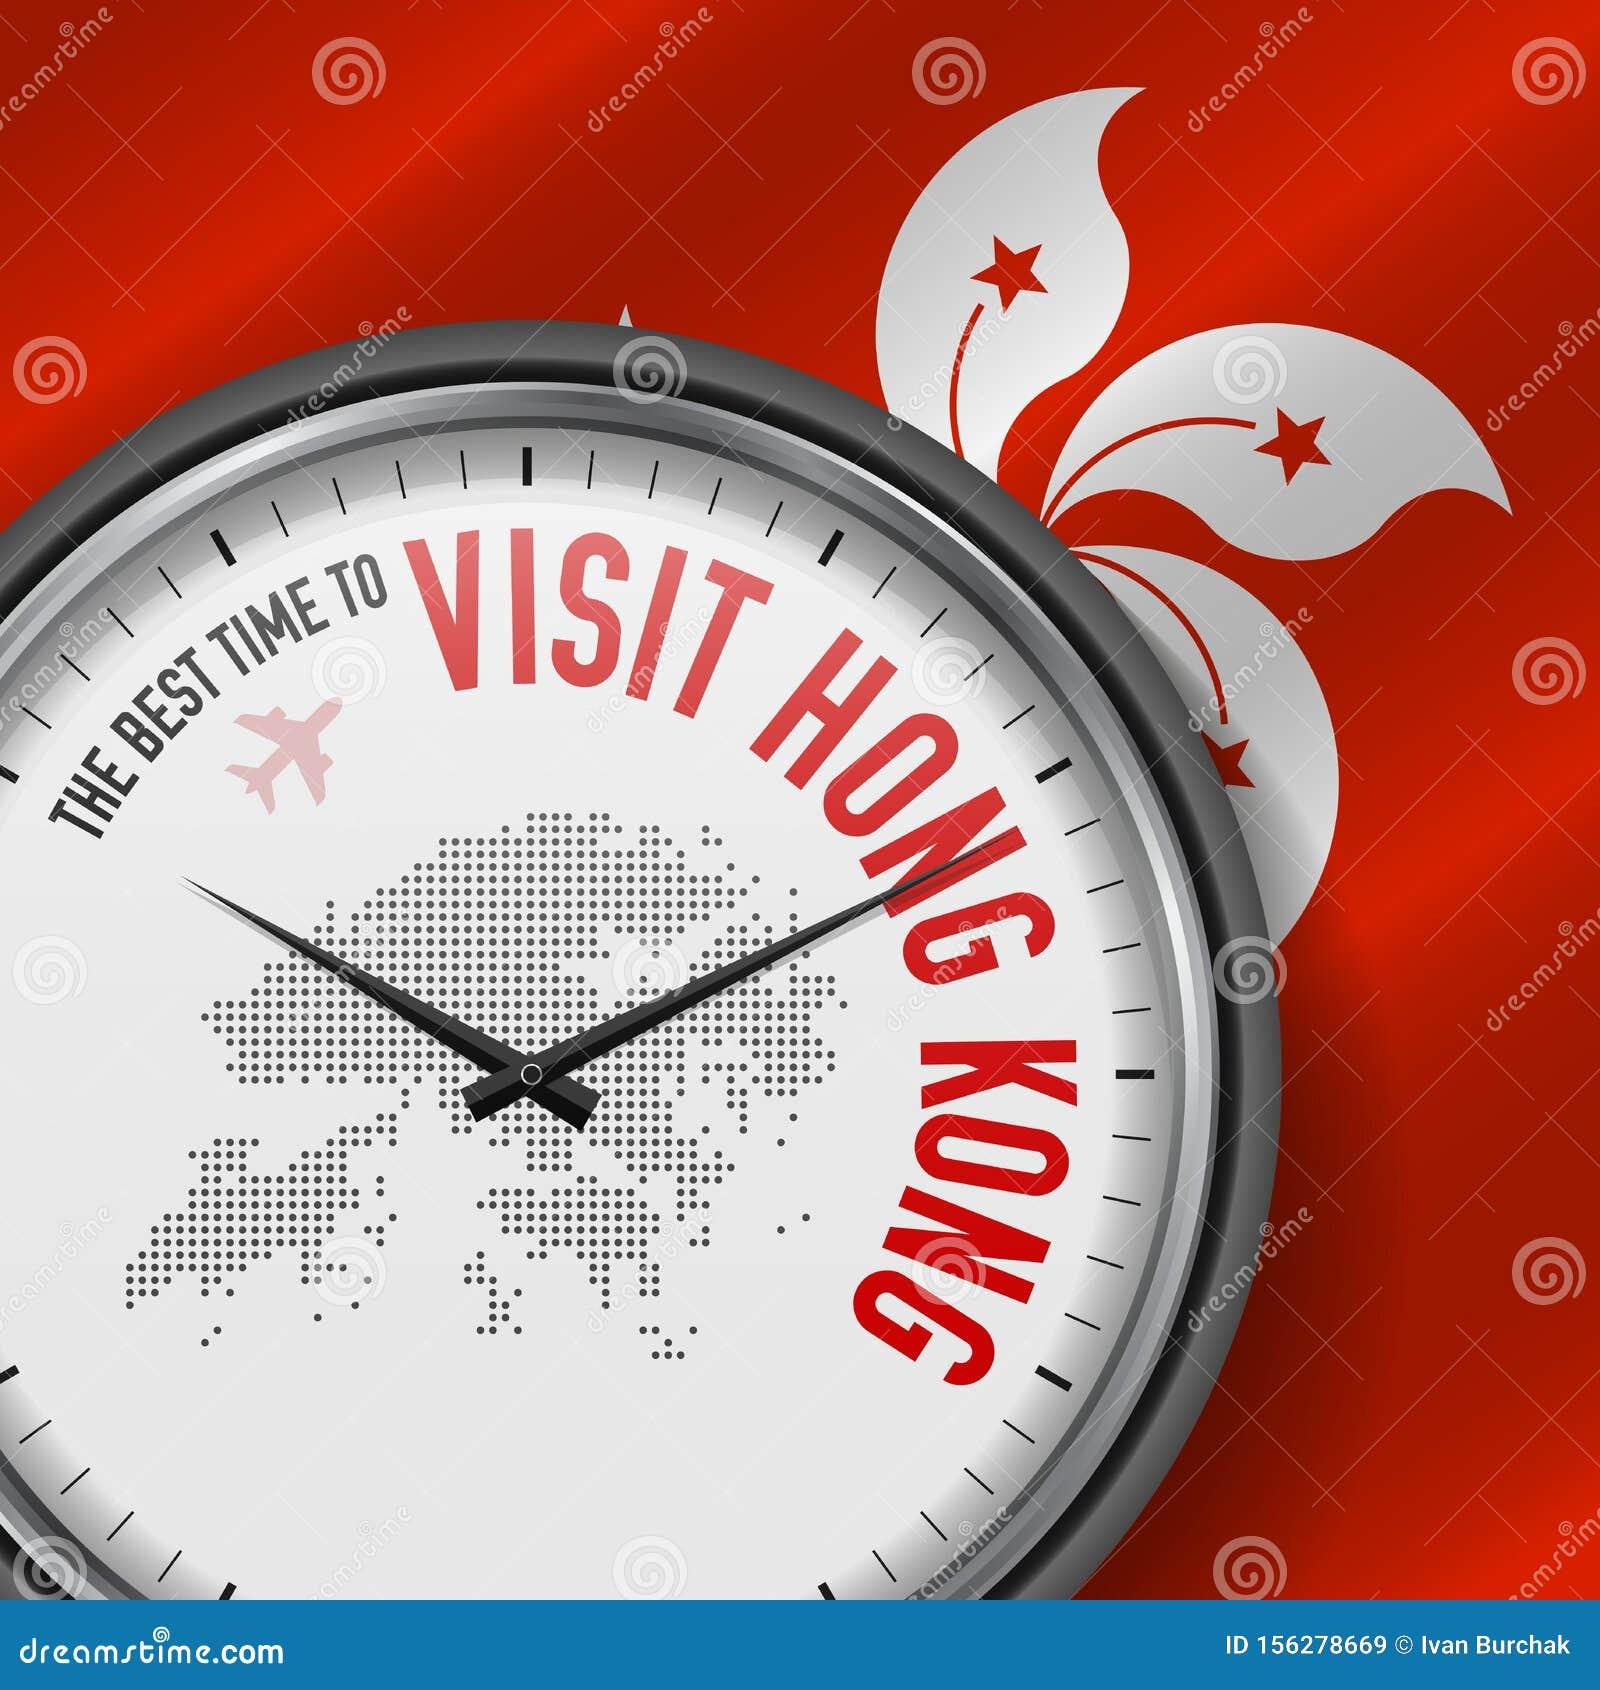 The Best Time to Visit Hong Kong. Flight, Tour to Hong Kong. Vector Illustration